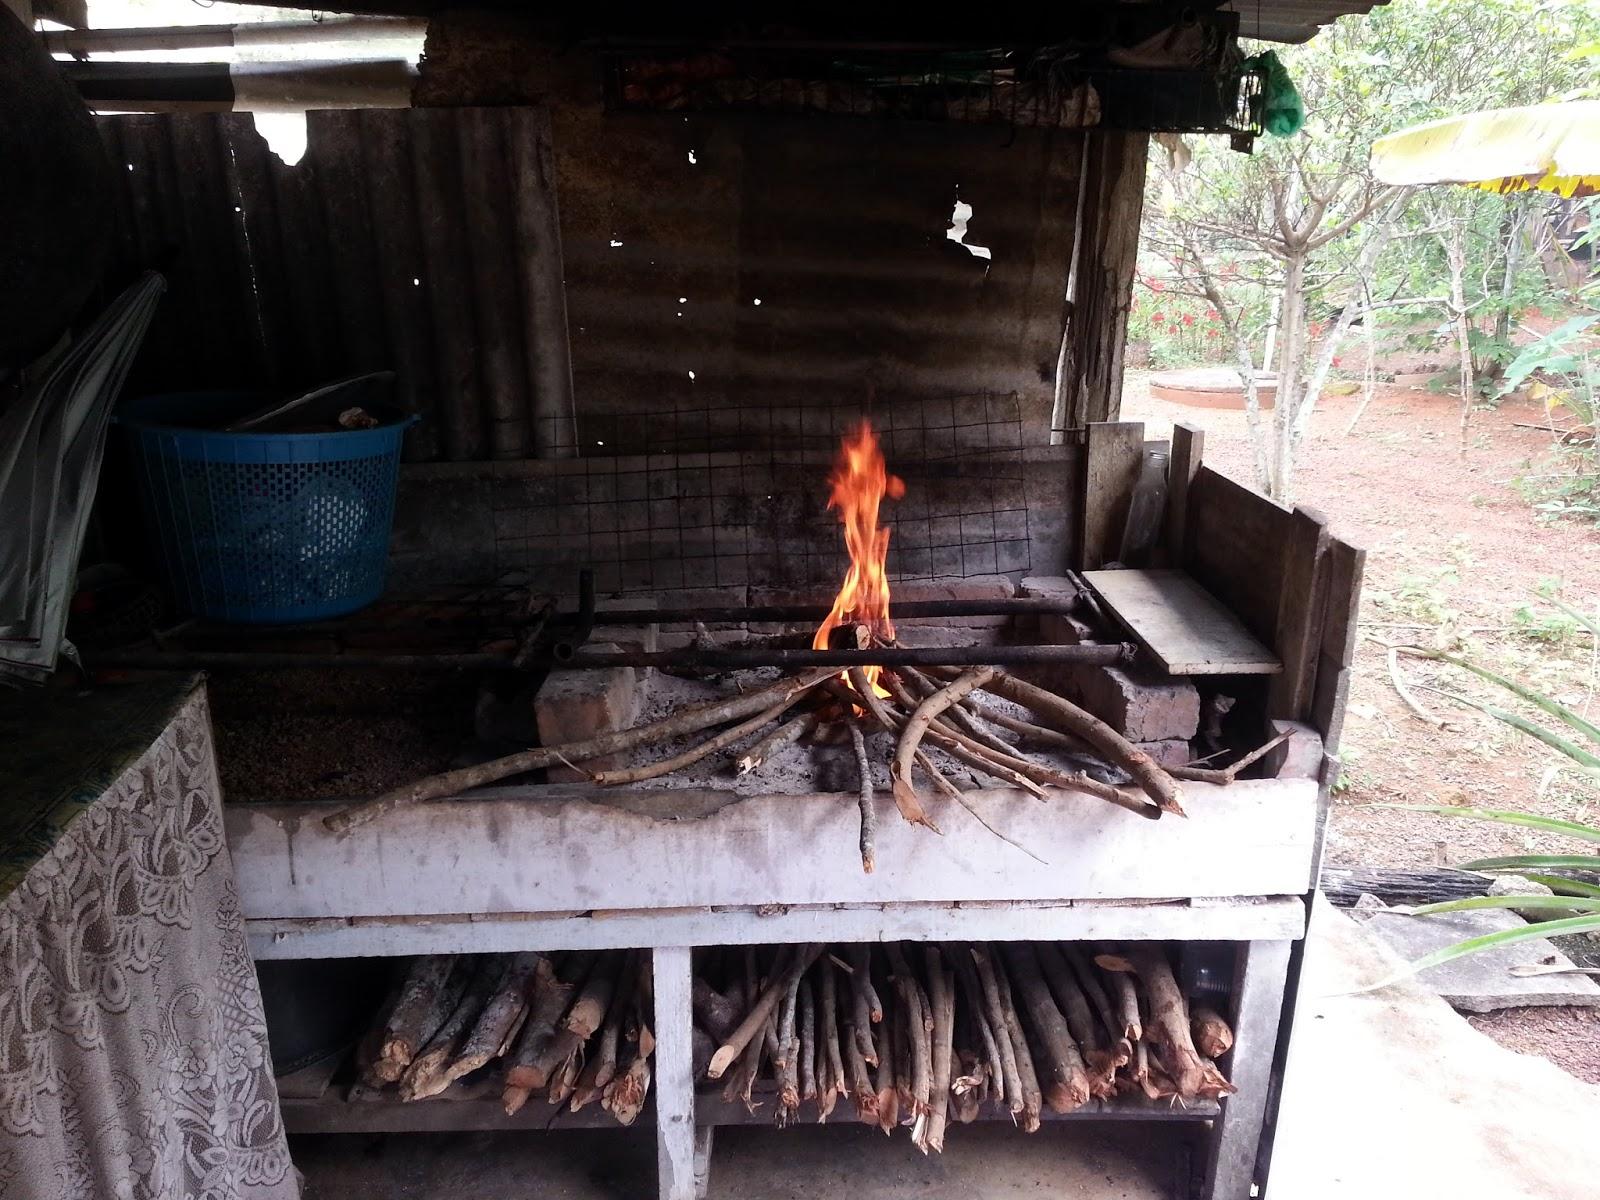 Ni La Bangsal Yang Ada Dapur Kayu Api Macam Best Giler Kan Kata Kat Bonot Nak Bakar Ikan Buat Style Daging Salai Masak Guna Haba Bukan